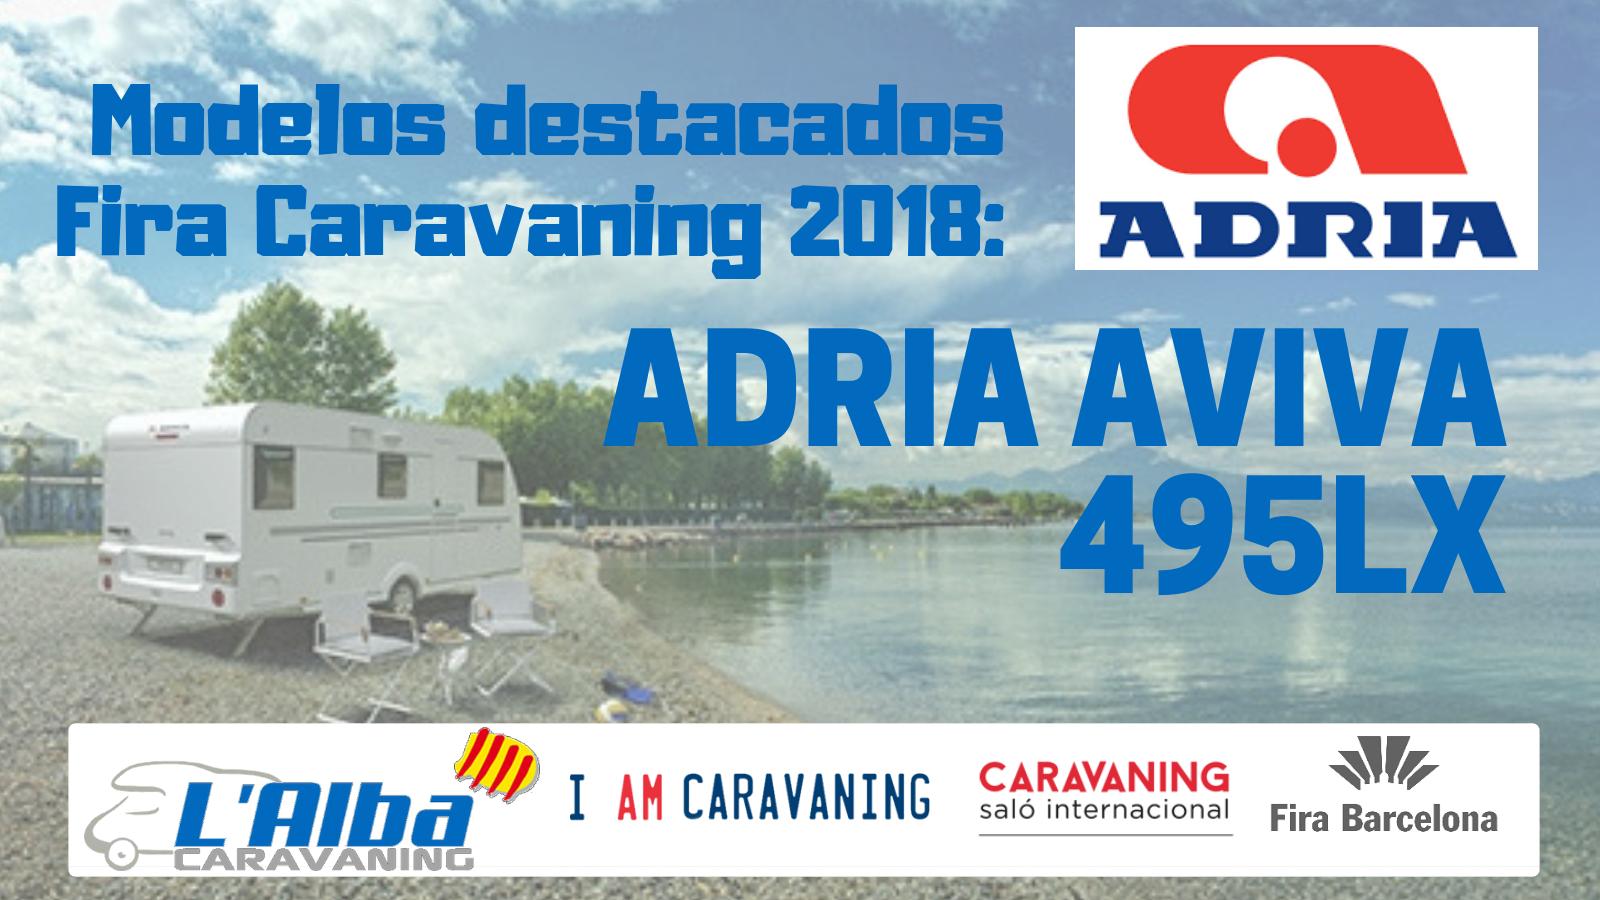 Fira Caravaning 2018 Adria Aviva 495LX portada